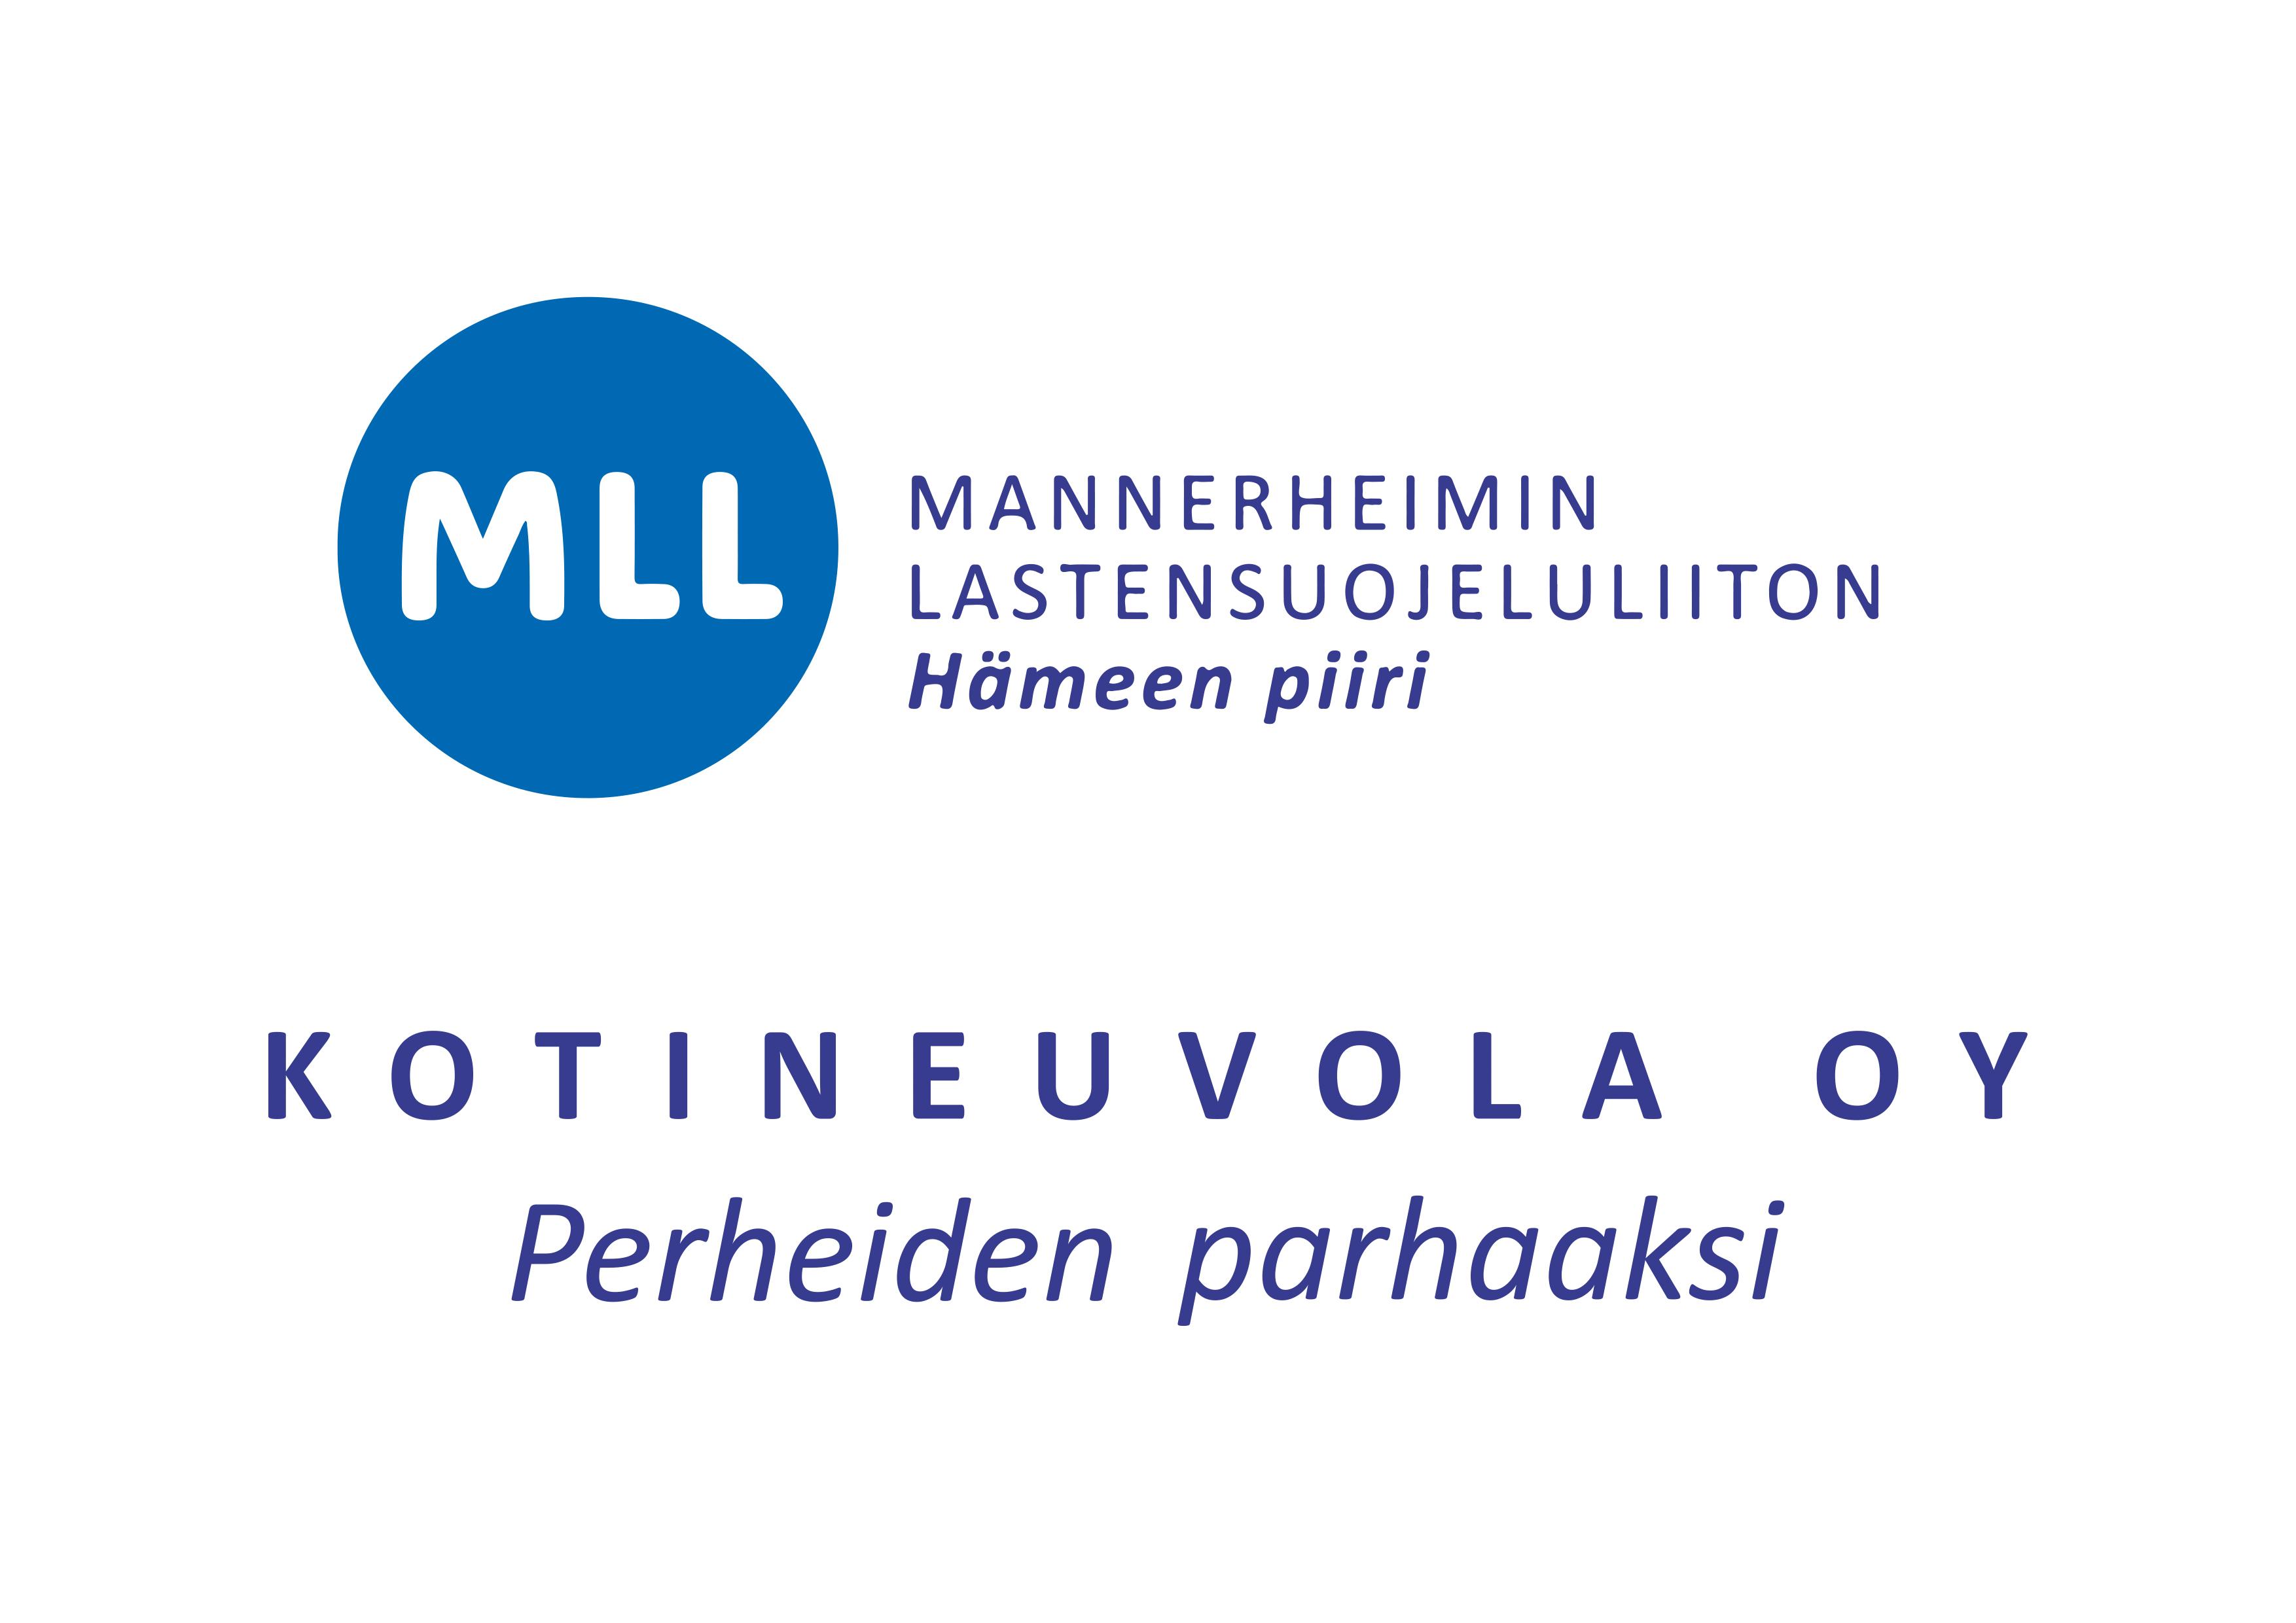 Kotineuvola logo 2019 jpg3